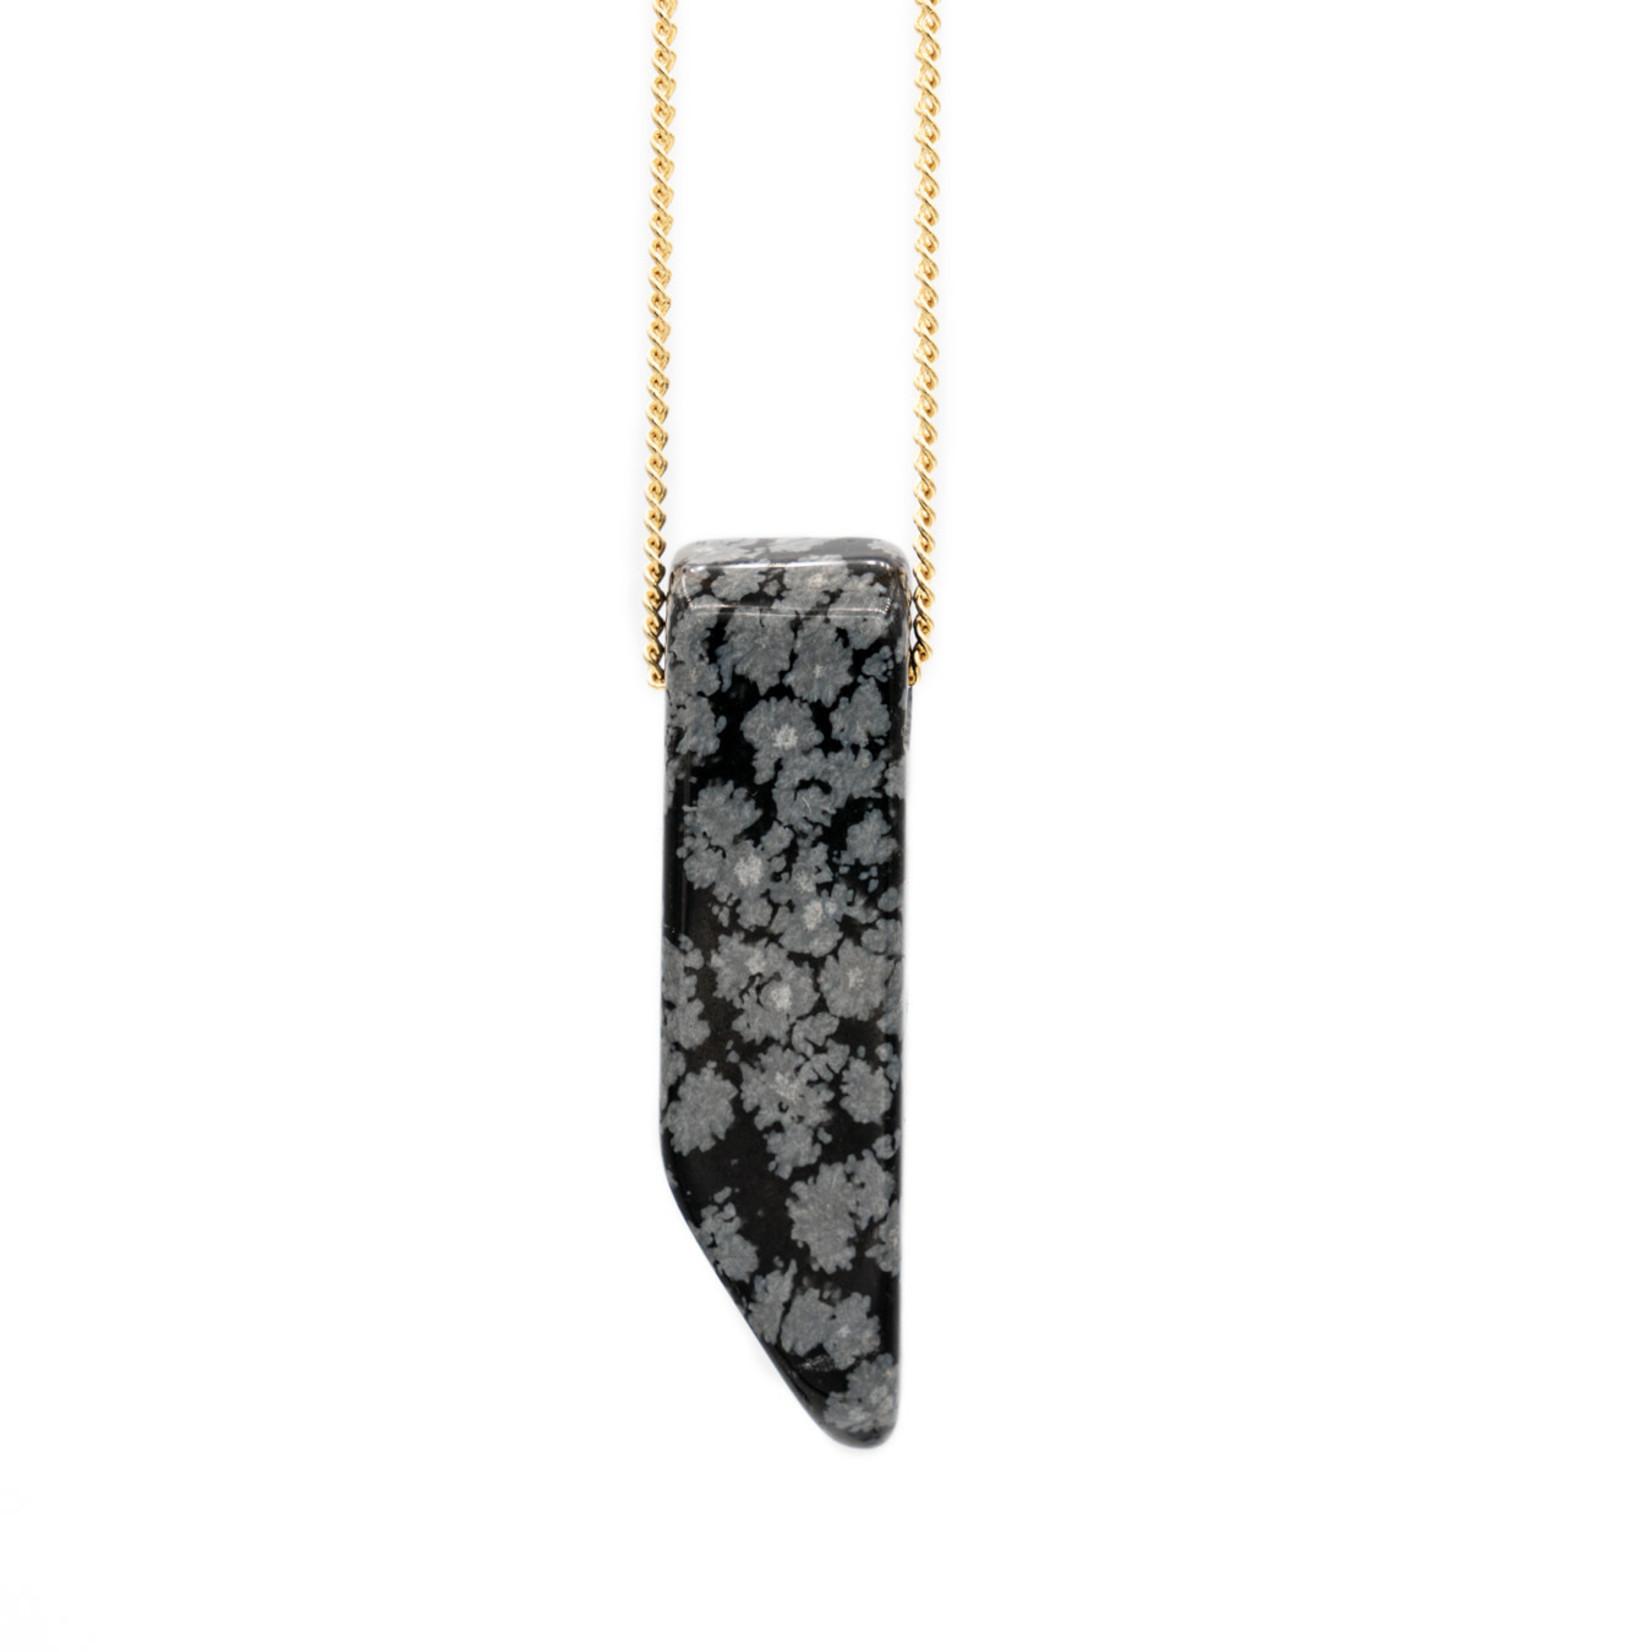 "Mana Made Jewelry Mana 28"" Stone Necklace Obsidian"